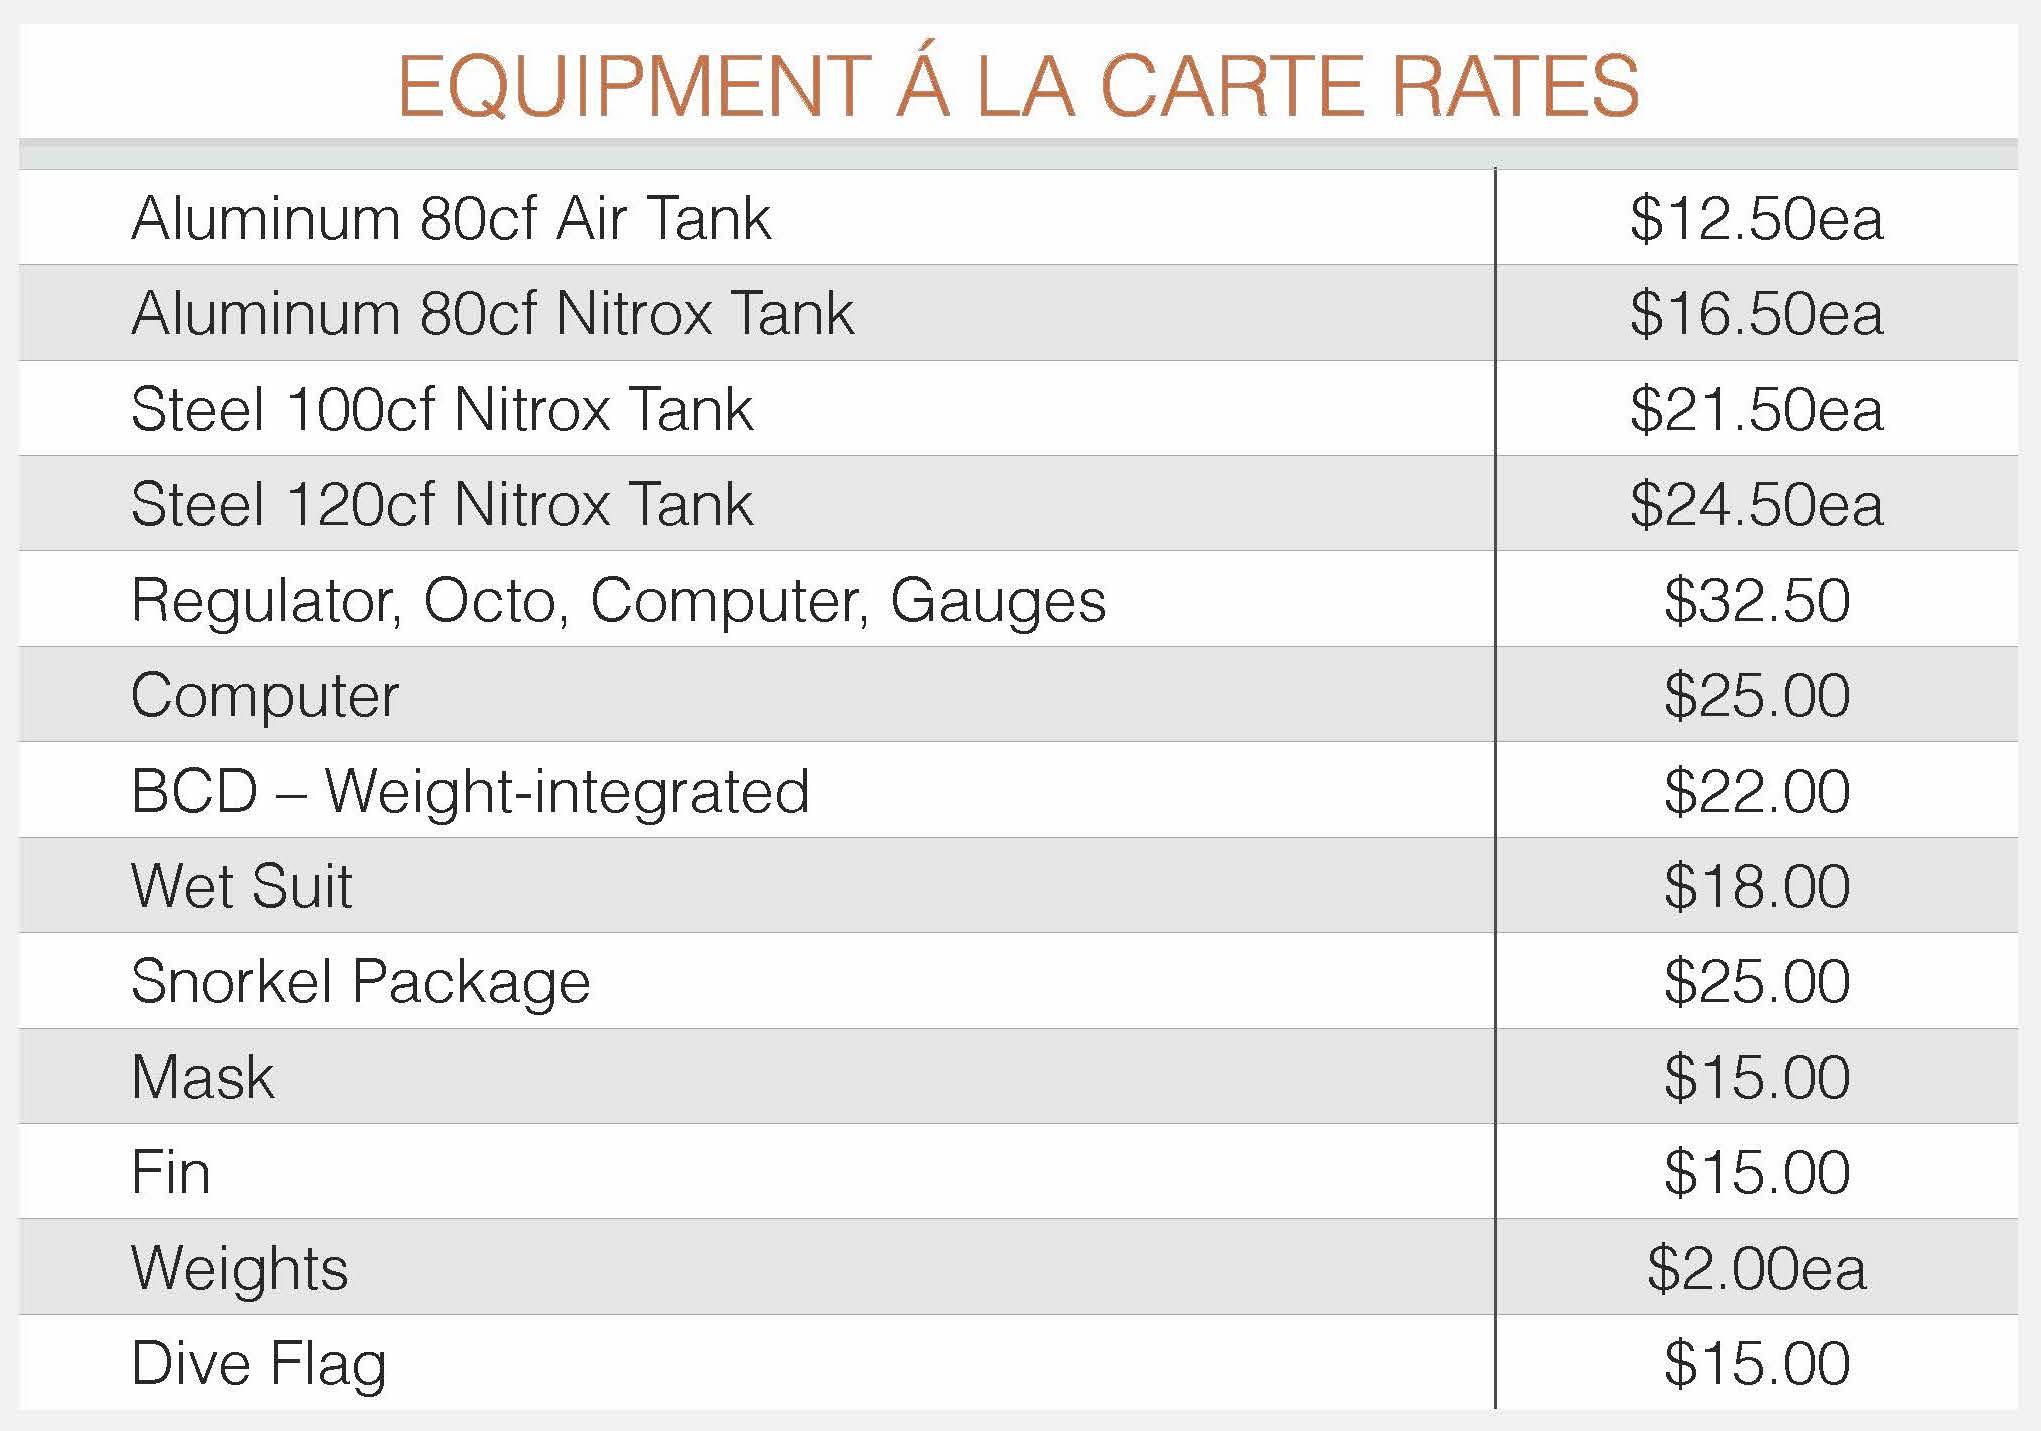 JDC A La Carte Pricing Table